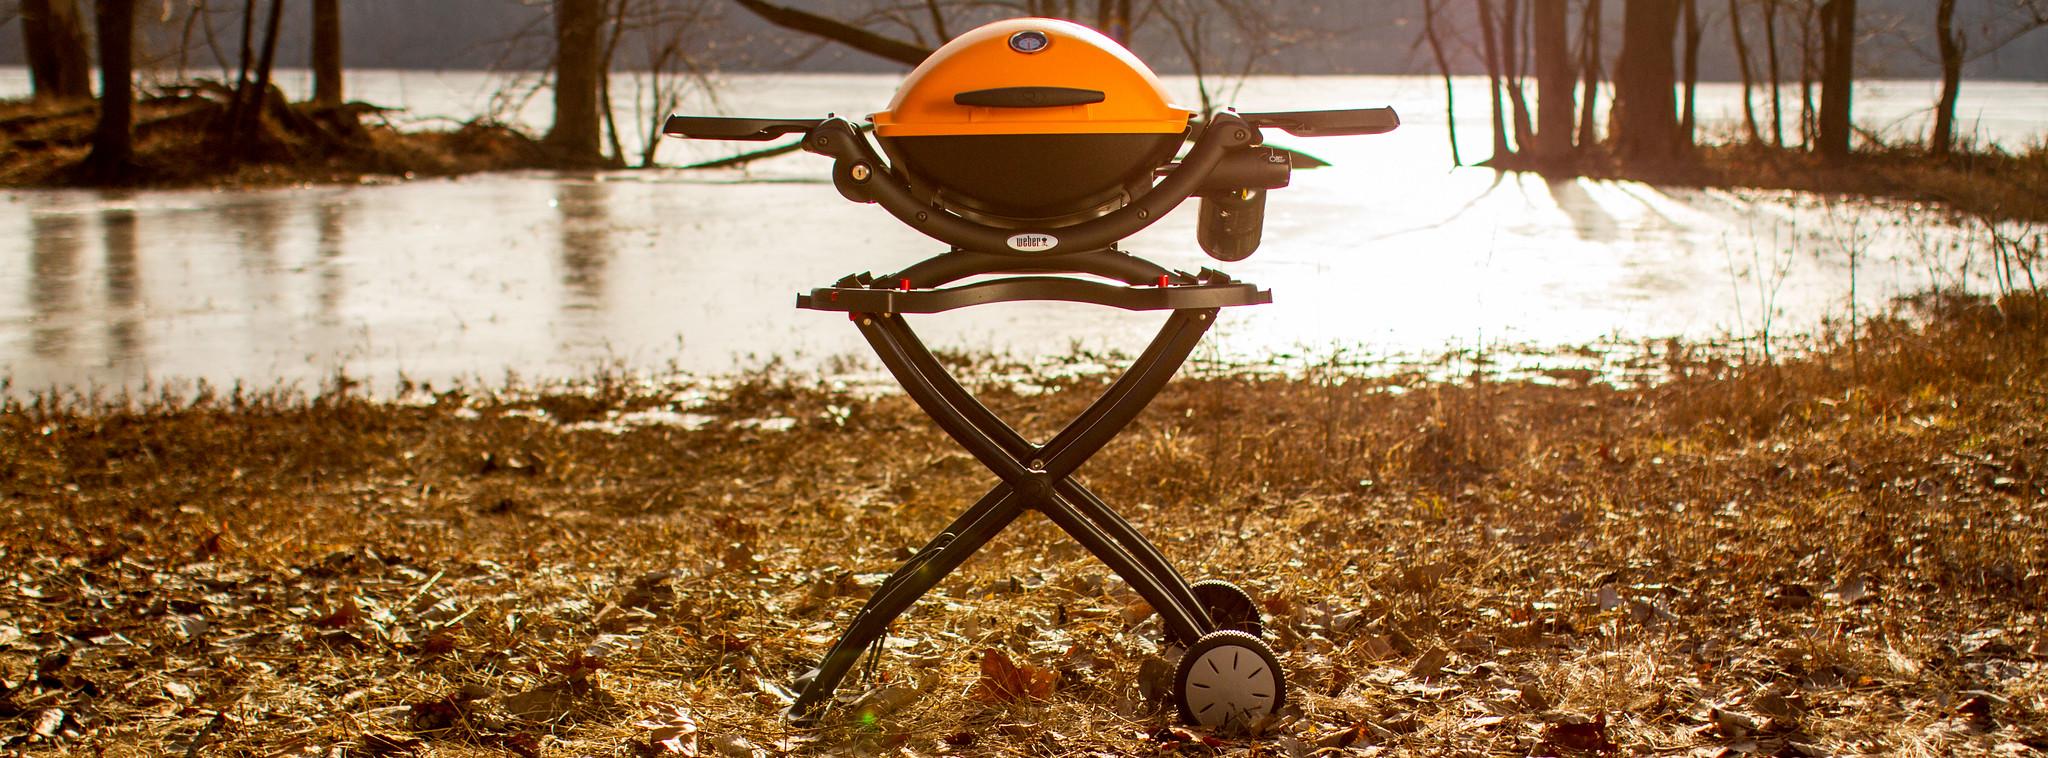 Orange Weber Q on Cart